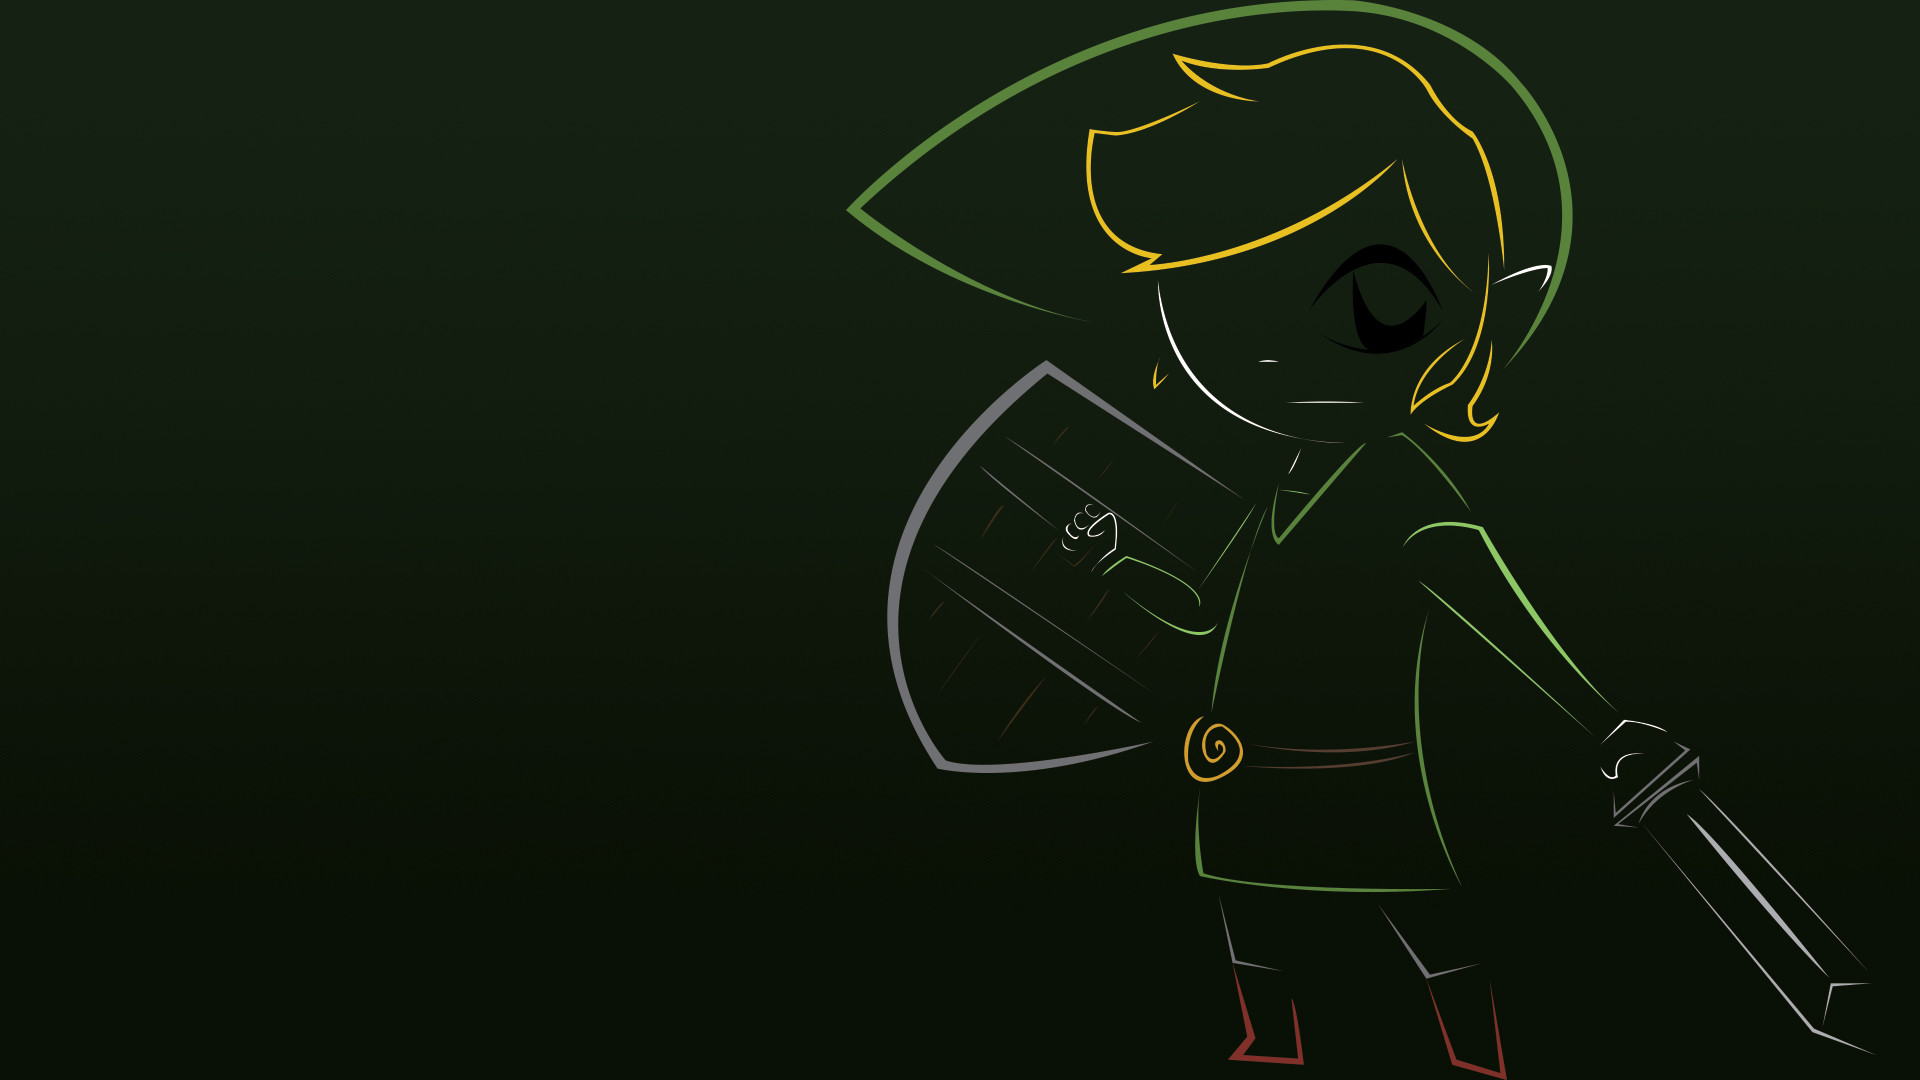 Legend Of Zelda Ocarina Of Time Gohma Wallpaper Zelda Wallpapers Wallpapers)